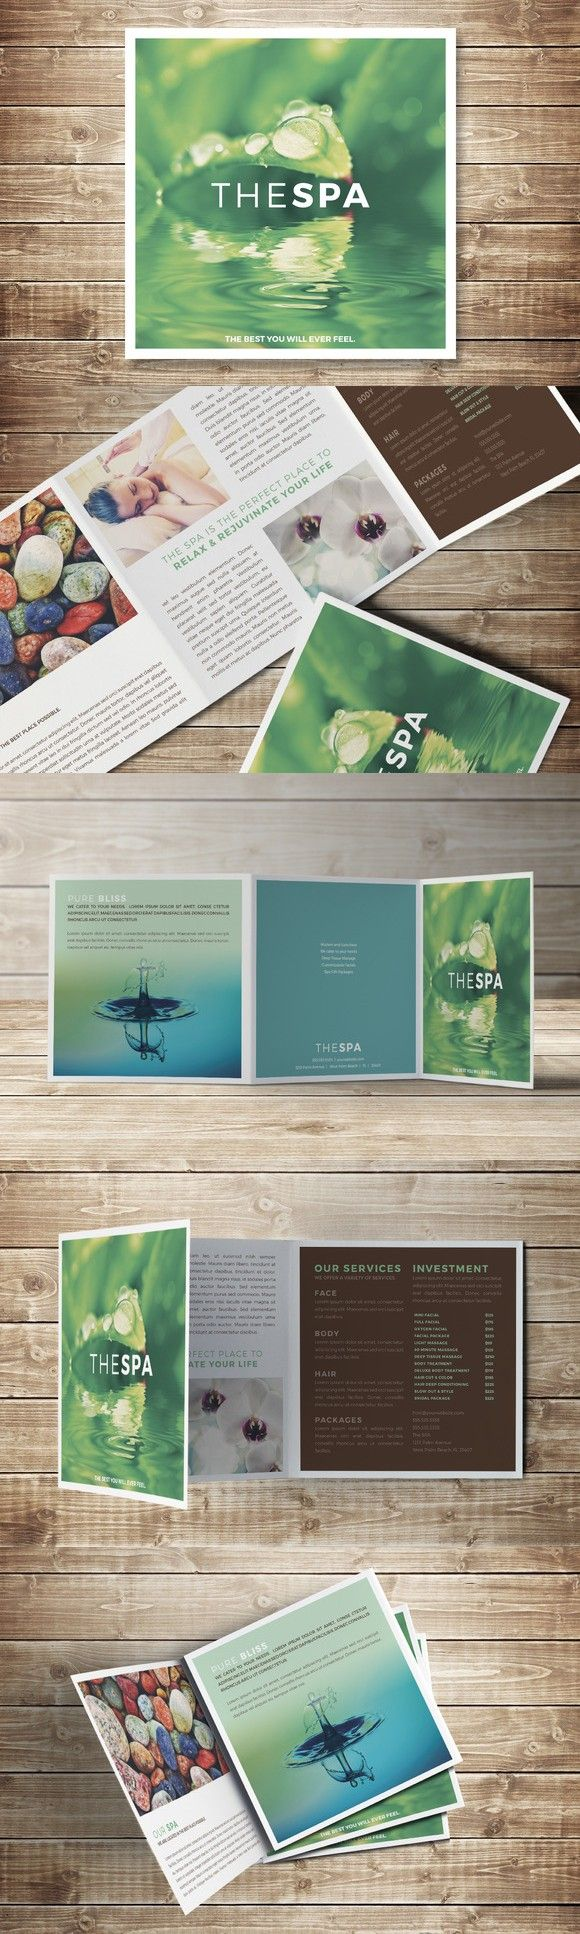 The Spa Trifold Square Brochure  Brochure Templates